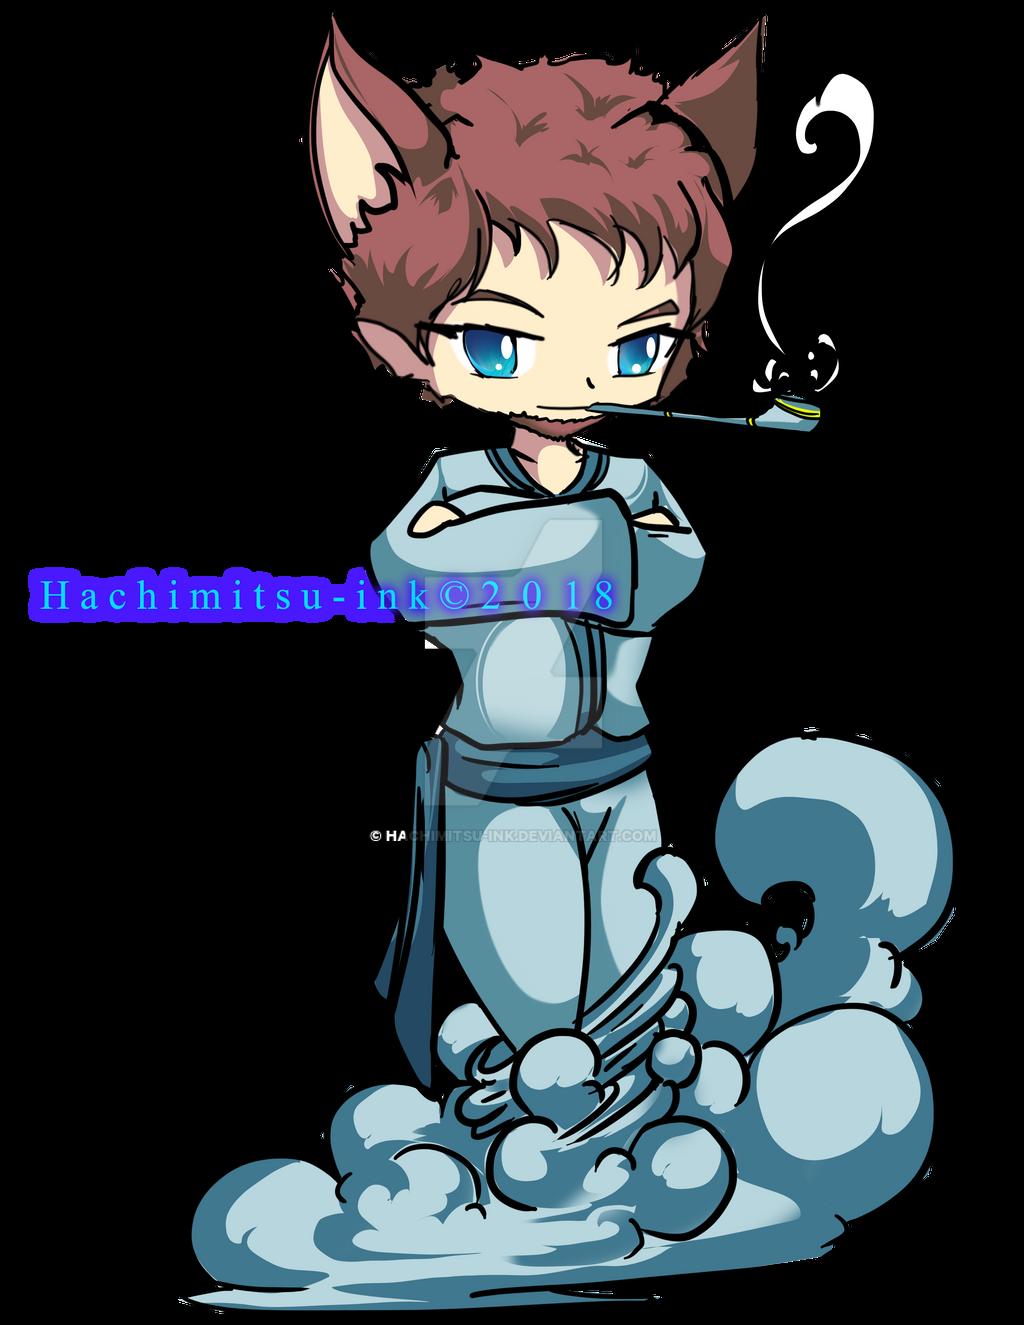 Mr kitsune by hachimitsu-ink